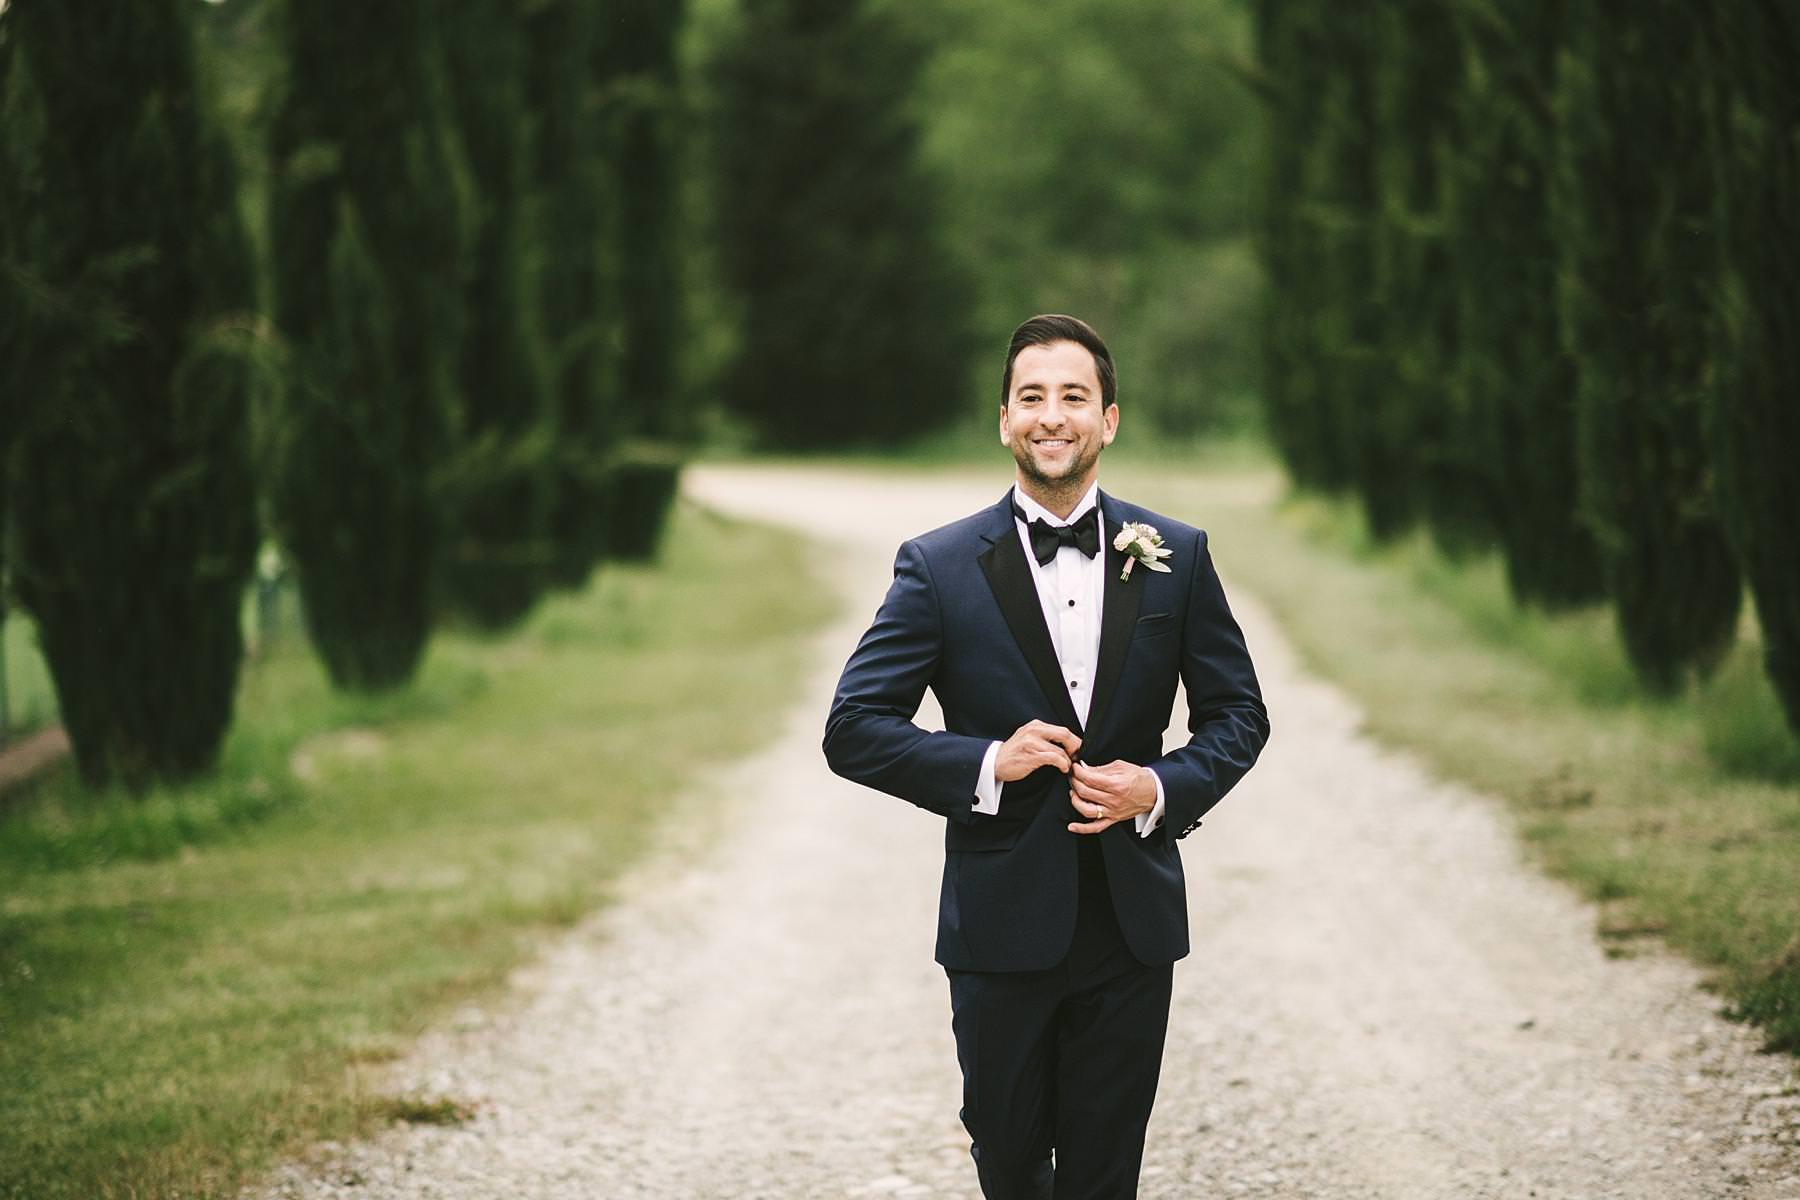 Elegant groom wedding portrait Tuscany countryside destination wedding event